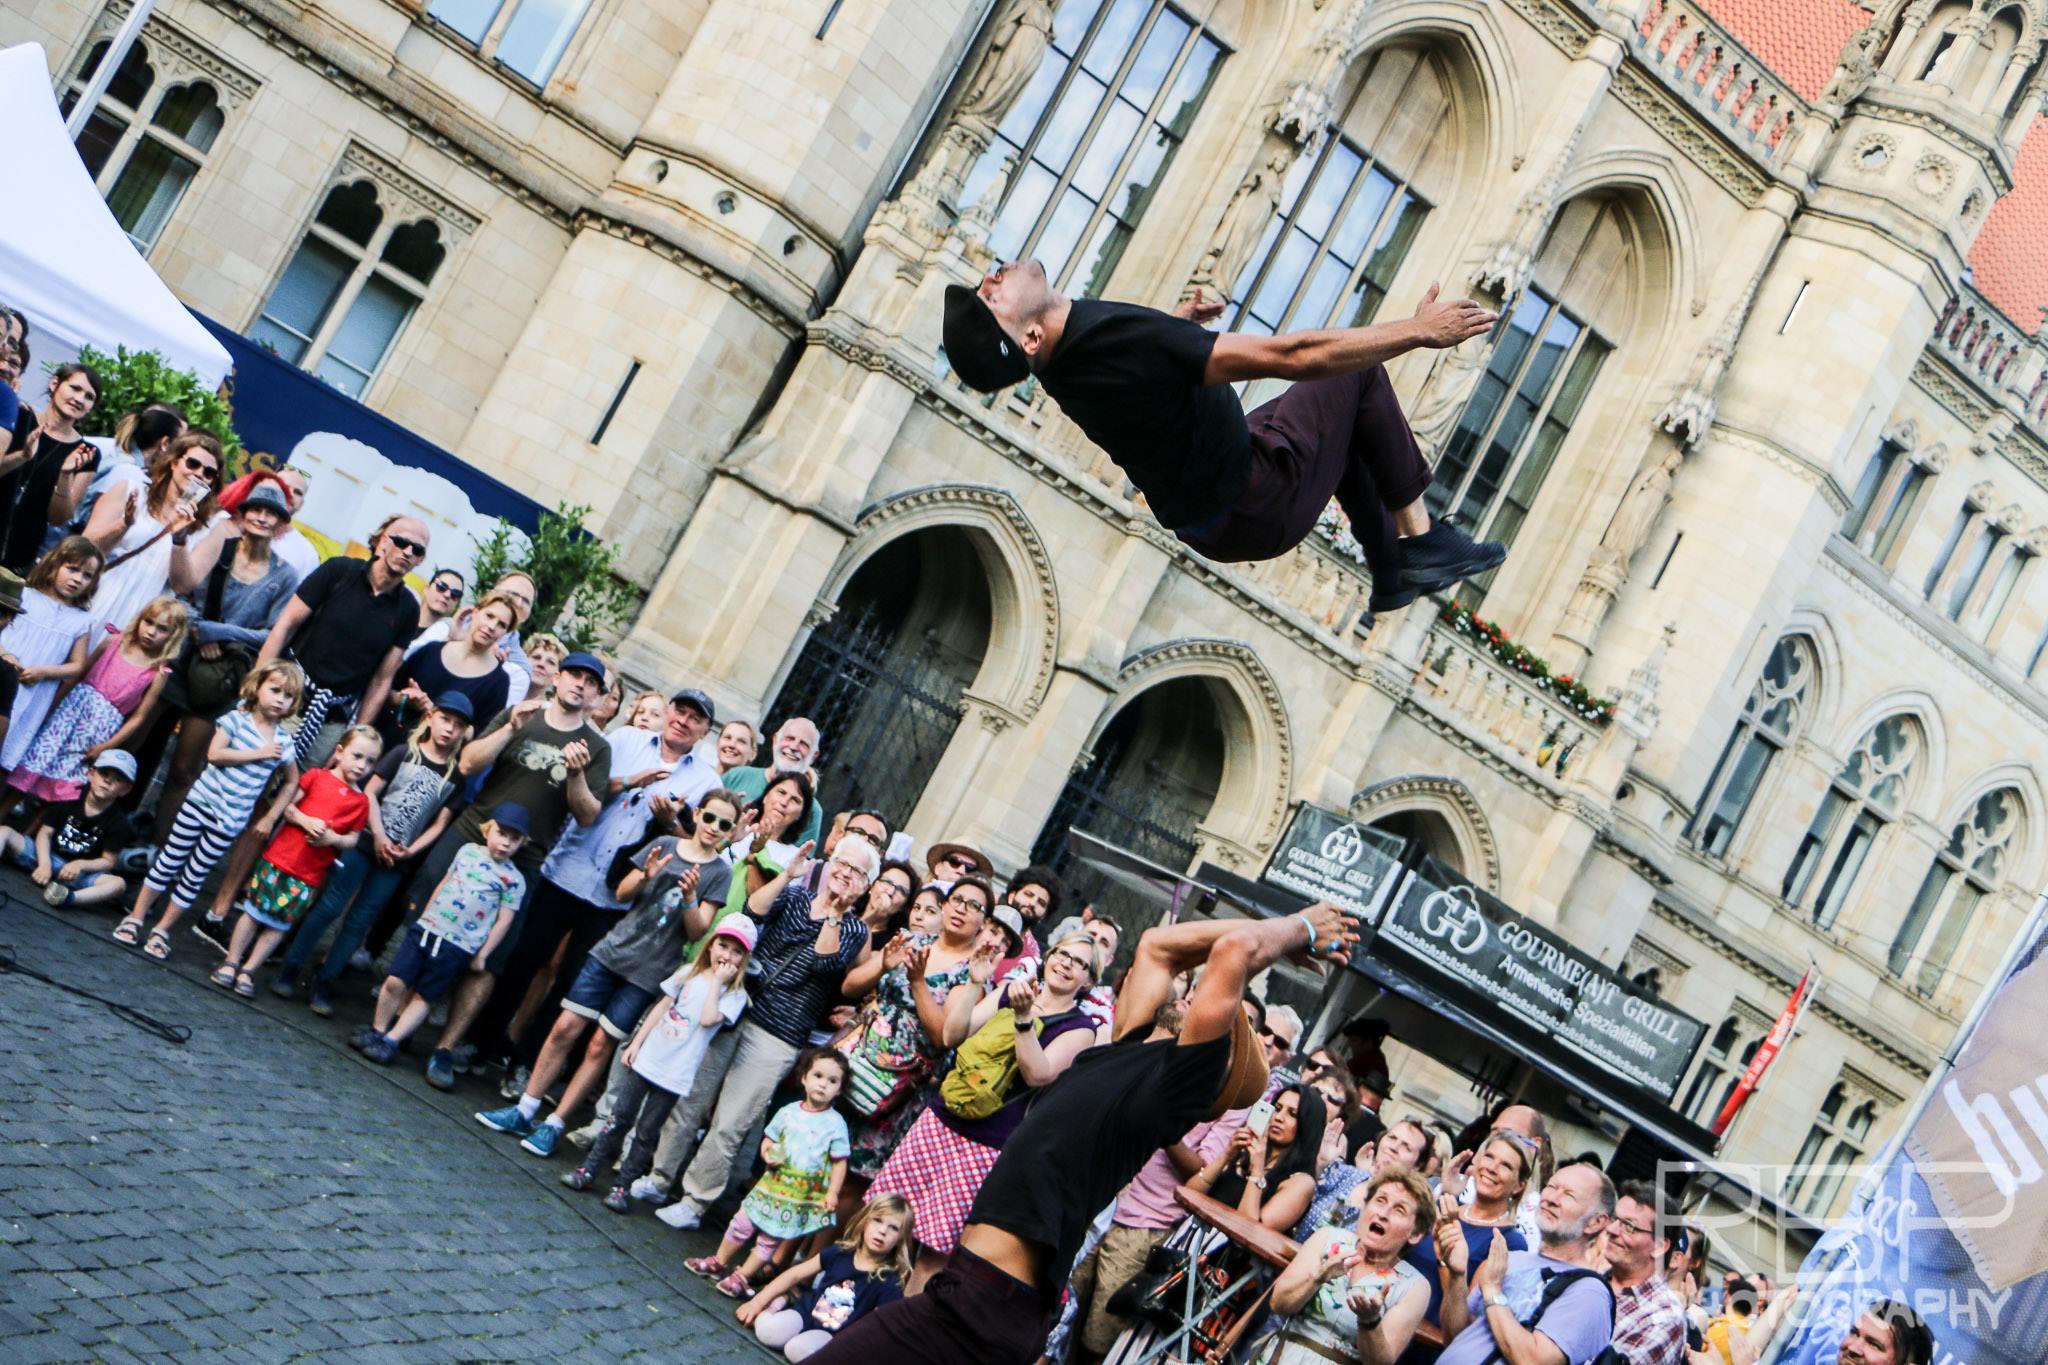 Spectacle de rue Breakdance en allemagne